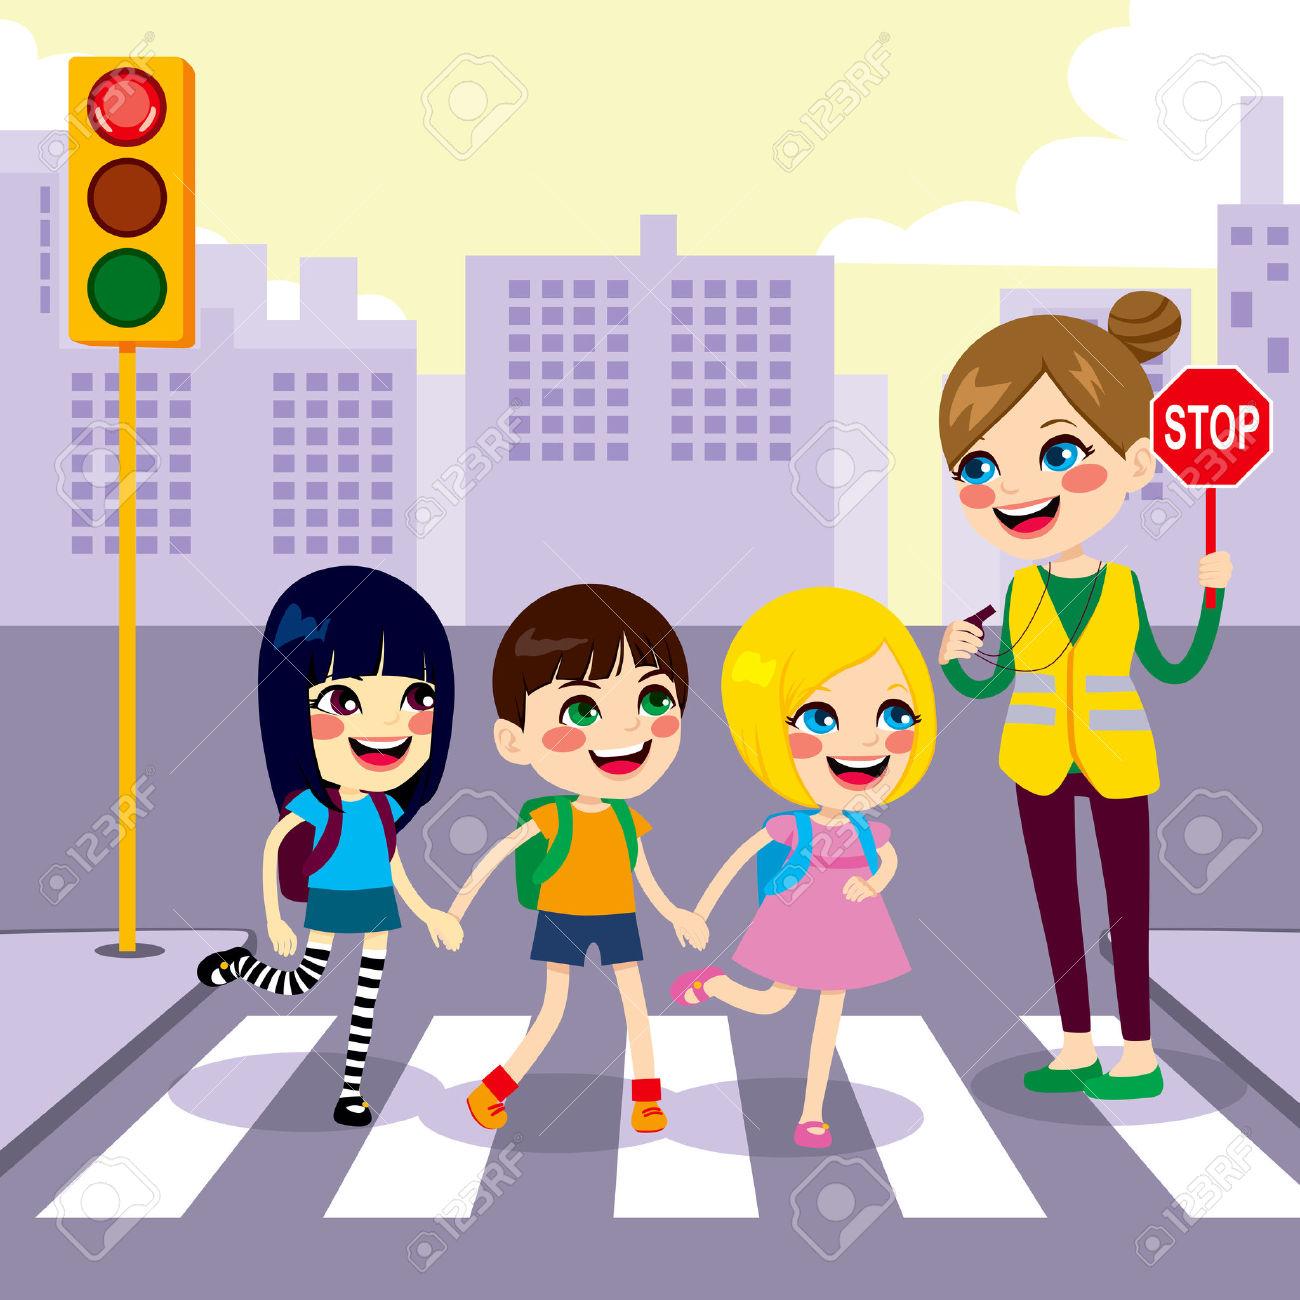 Three Cute Little Children School Students Crossing Street.